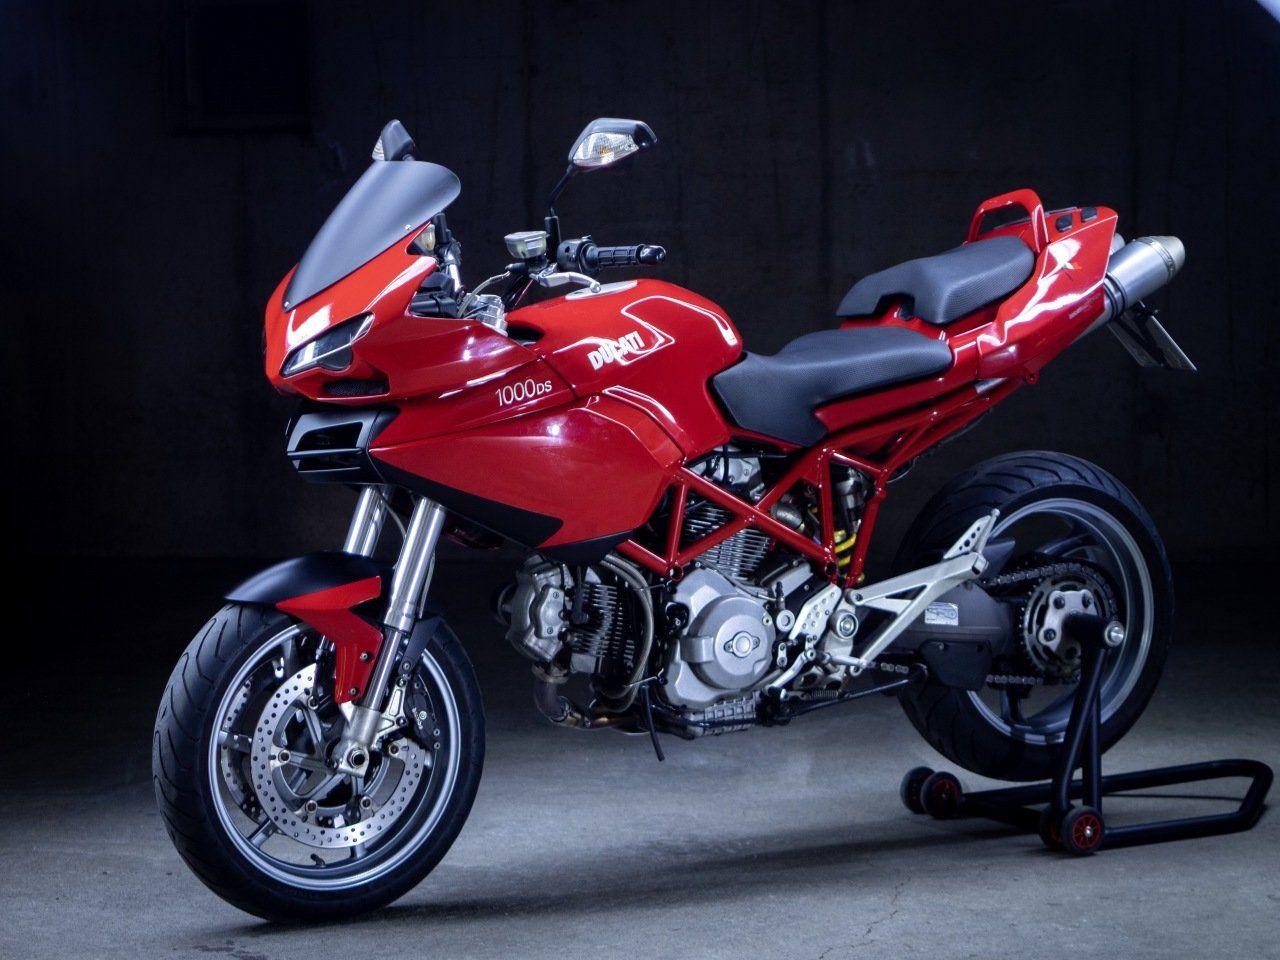 2008 Ducati Multistrada 1100 Red at Euro Cycles of Tampa